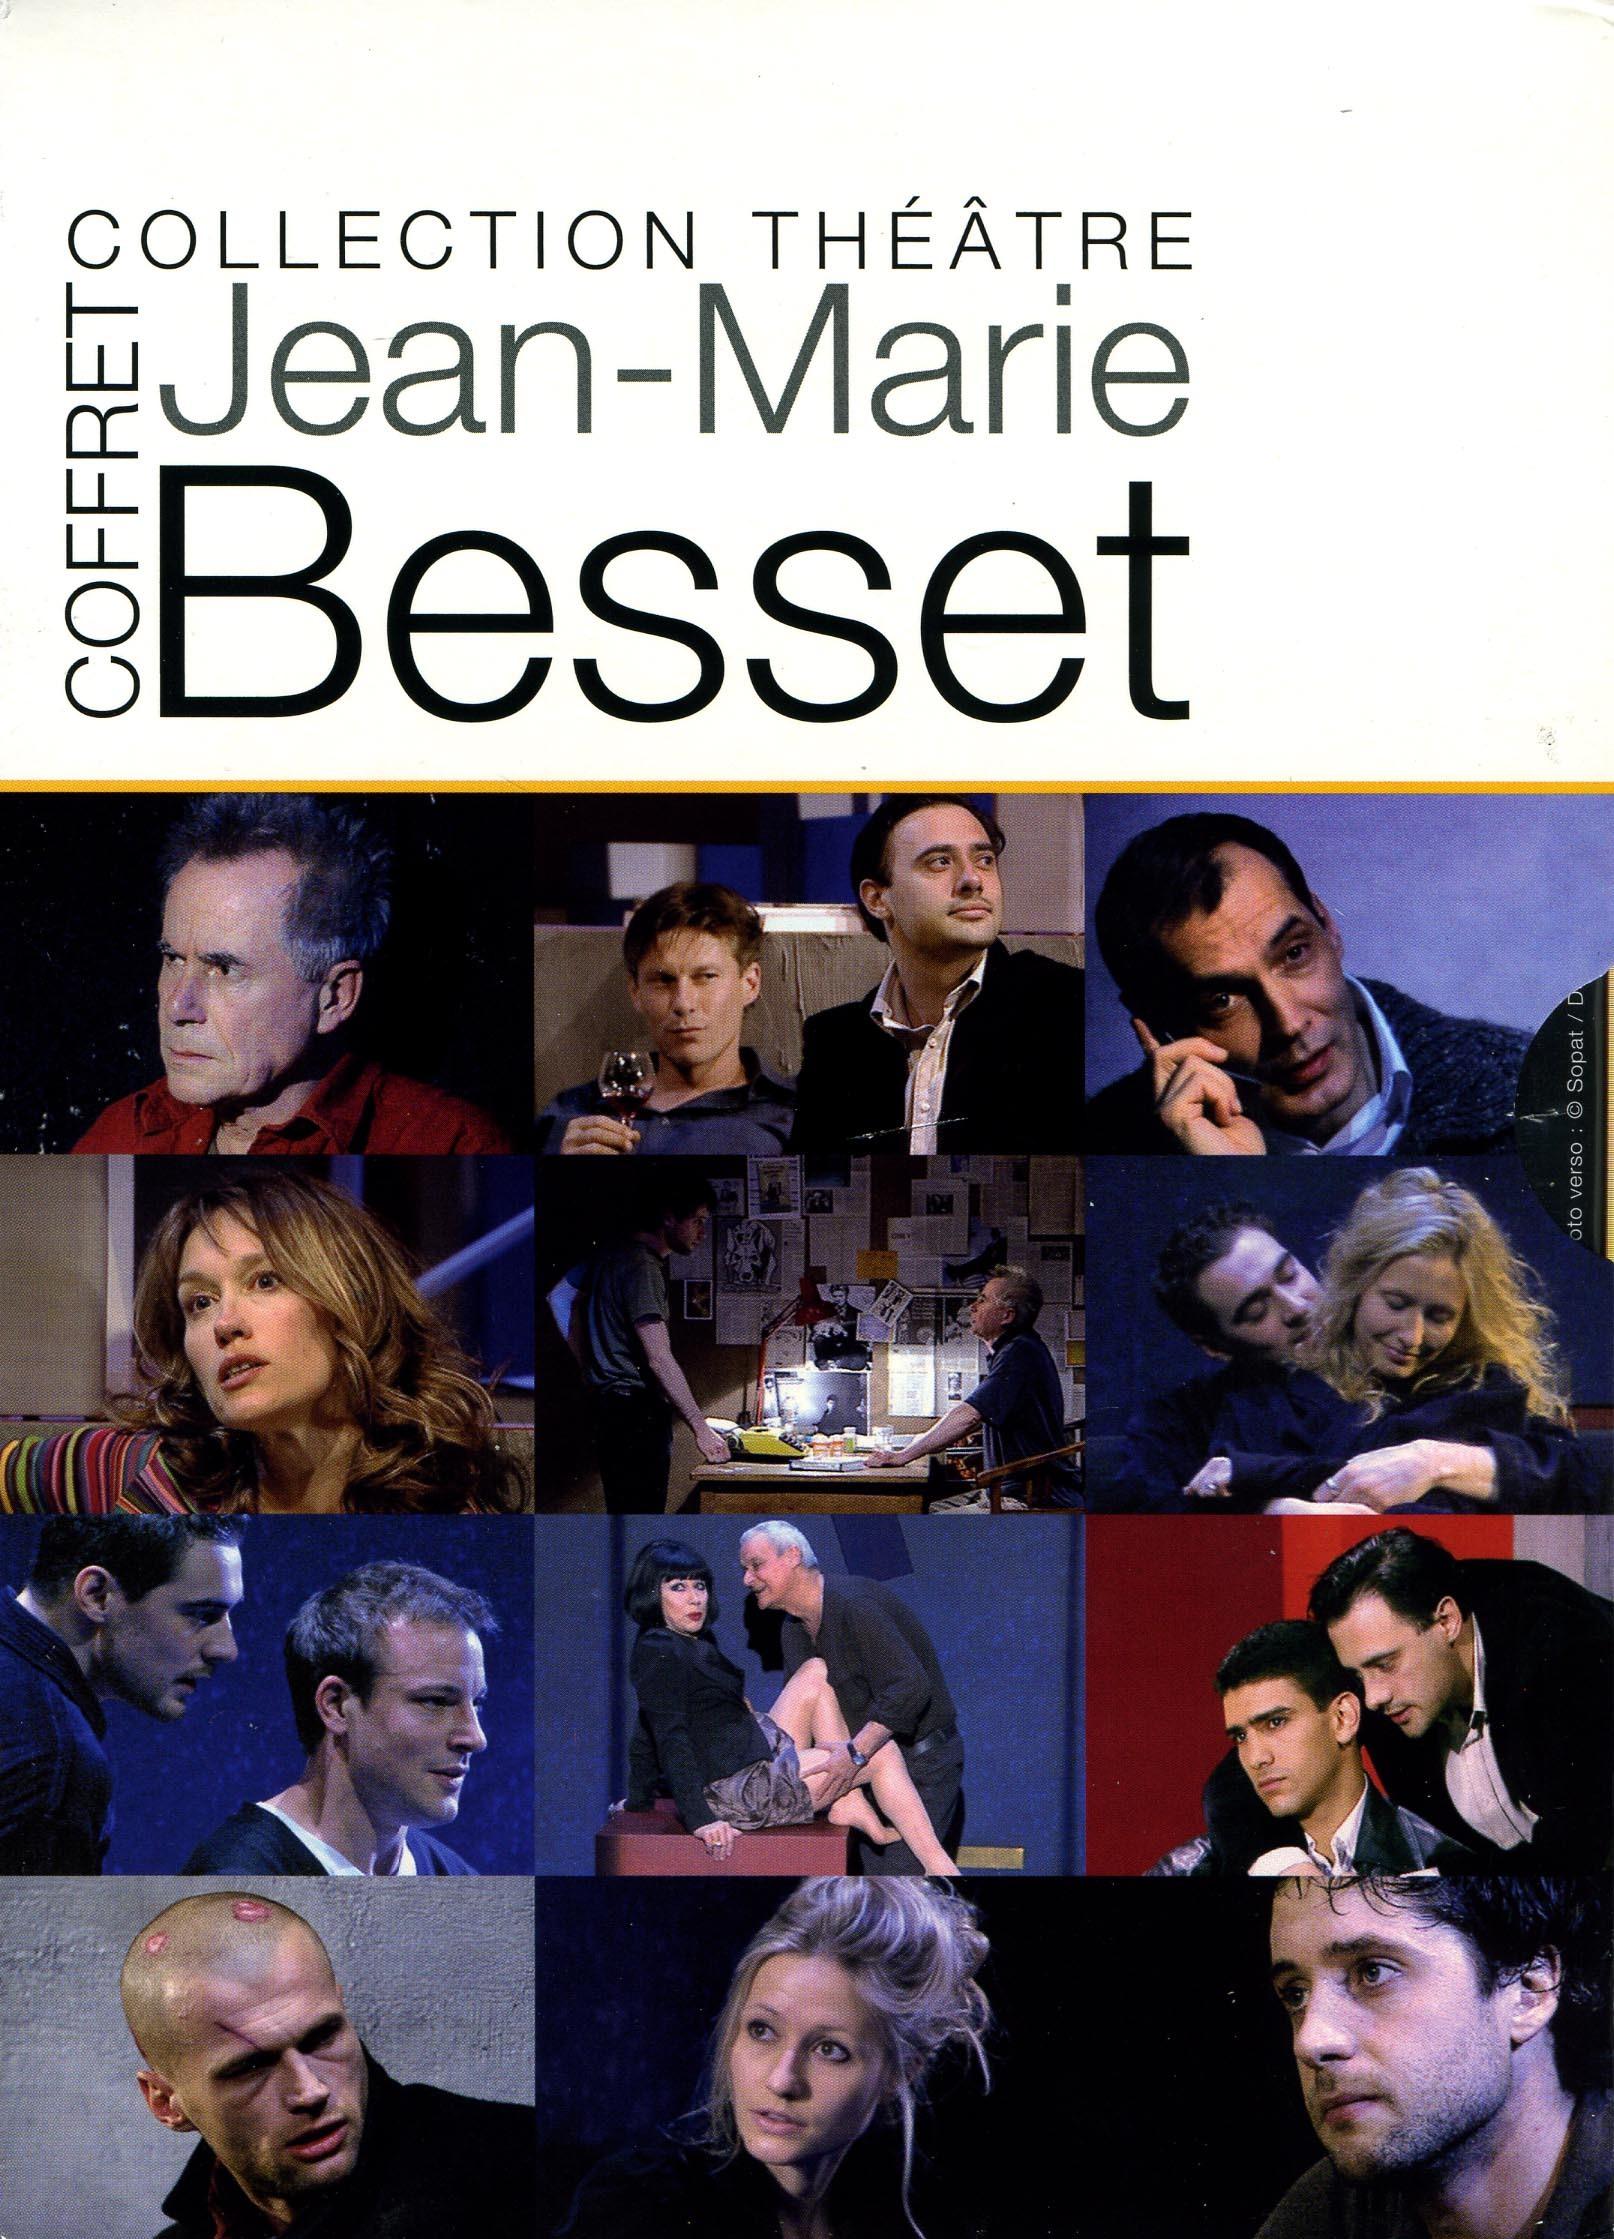 JEAN-MARIE BESSET - 4 DVD